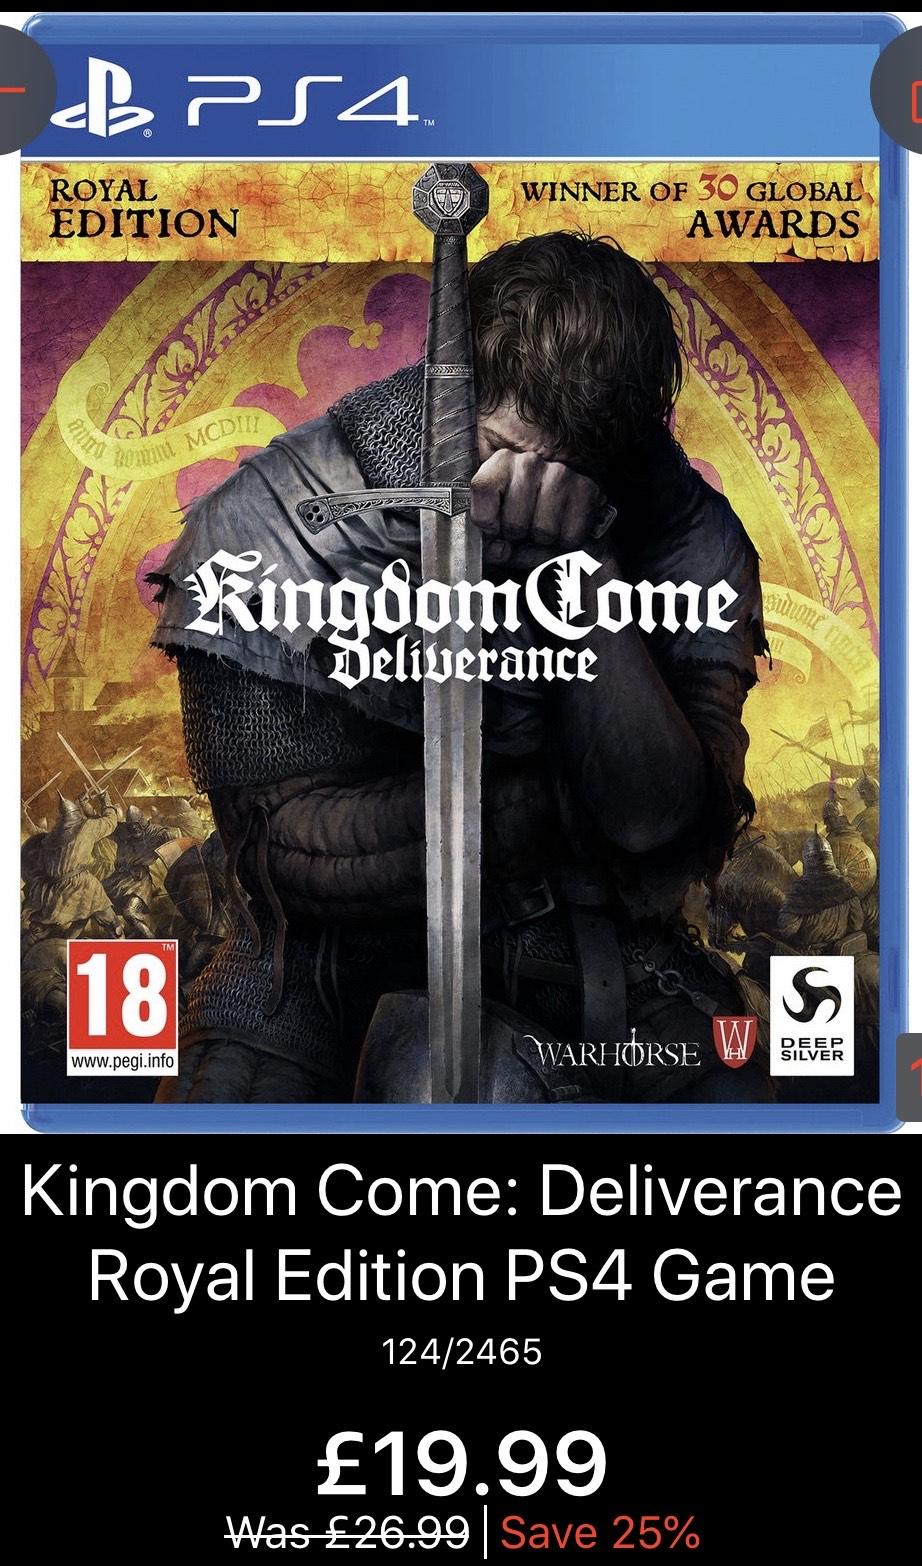 Kingdom Come: Deliverance Royal Edition PS4 Game £19.99 at Argos